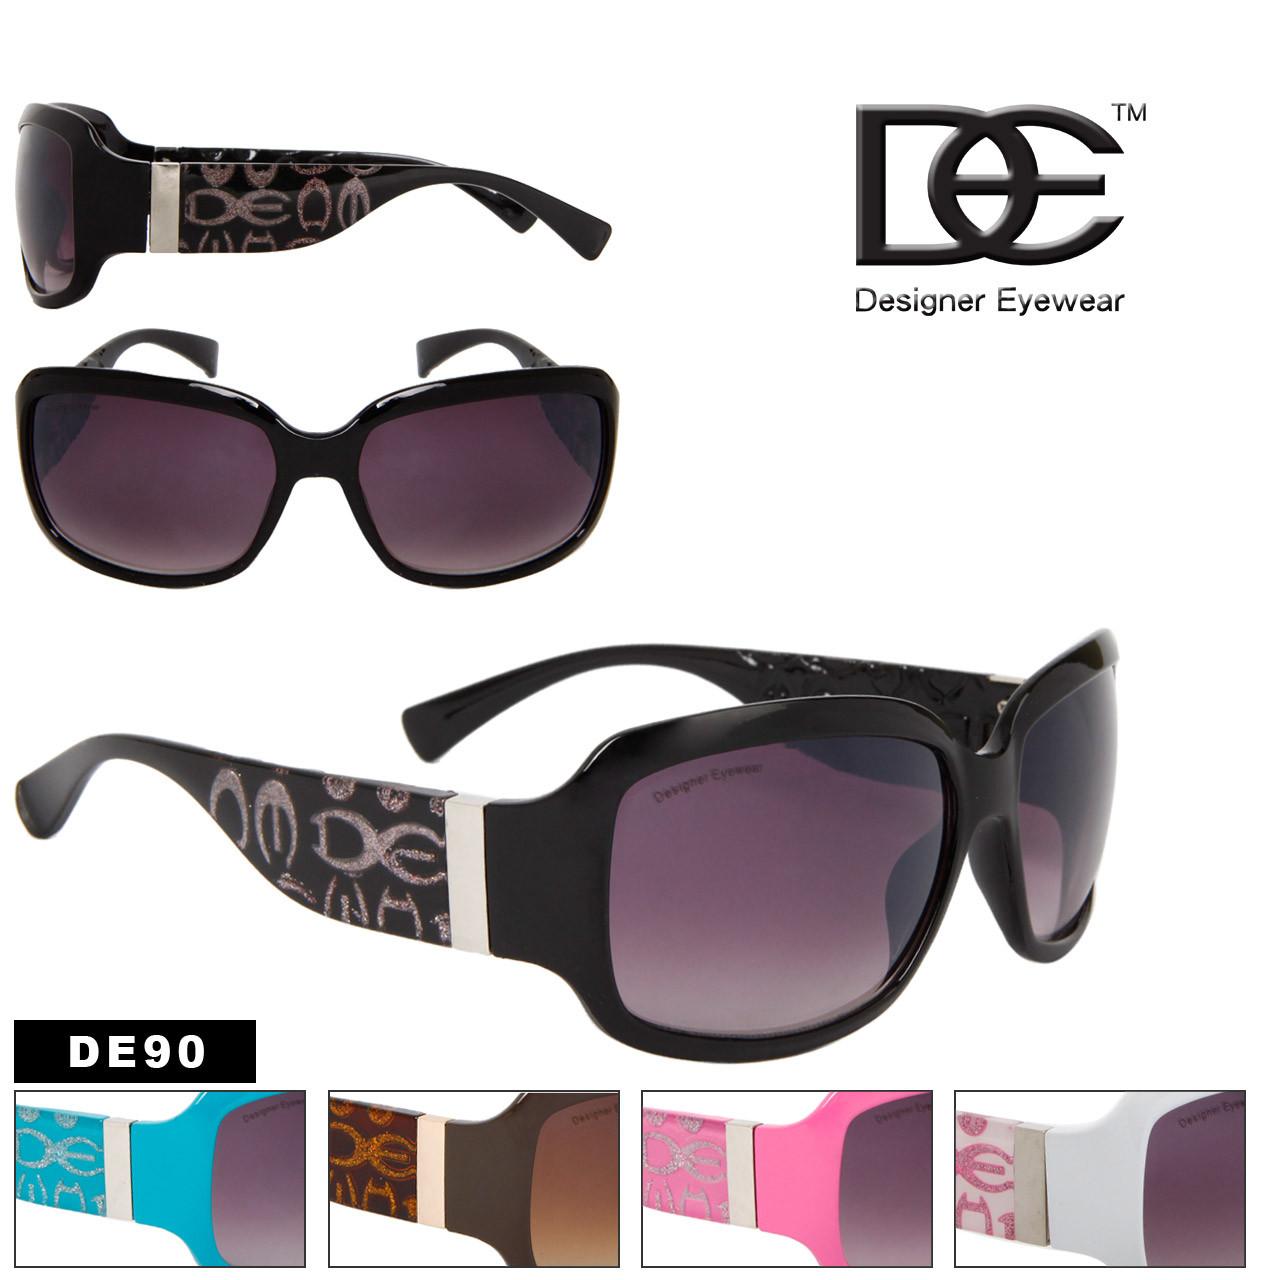 DE90 Women's Fashion Sunglasses